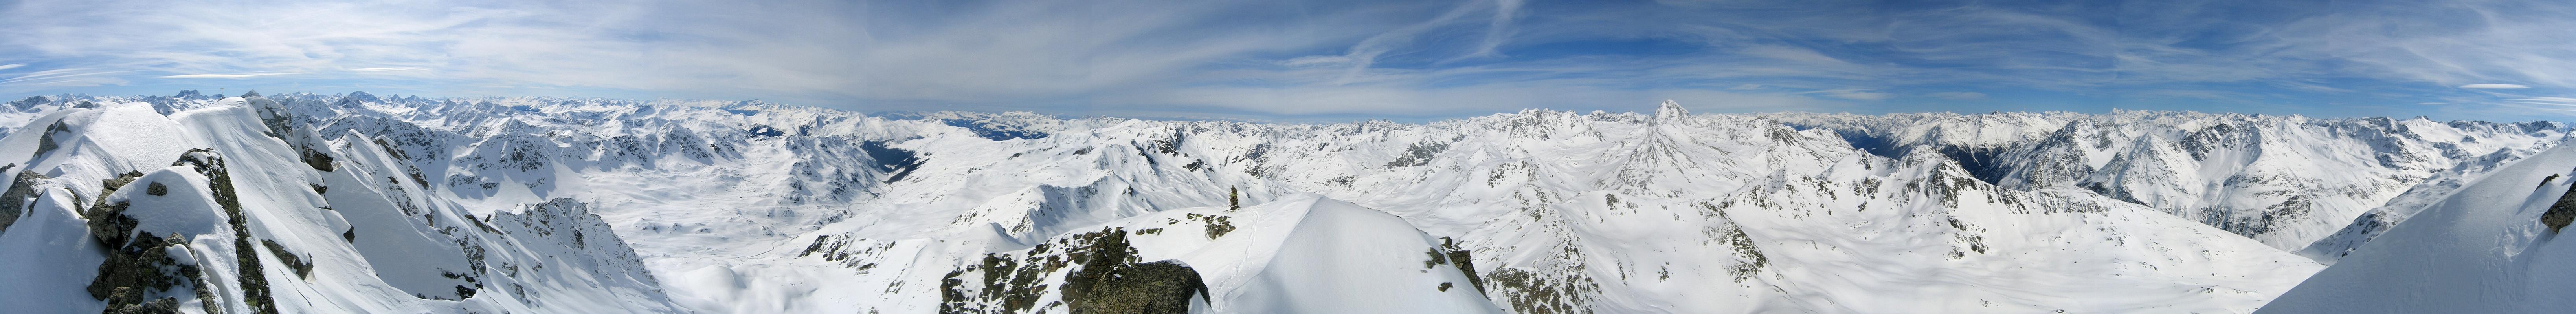 Flüela Wisshorn Albula Alpen Schweiz panorama 24